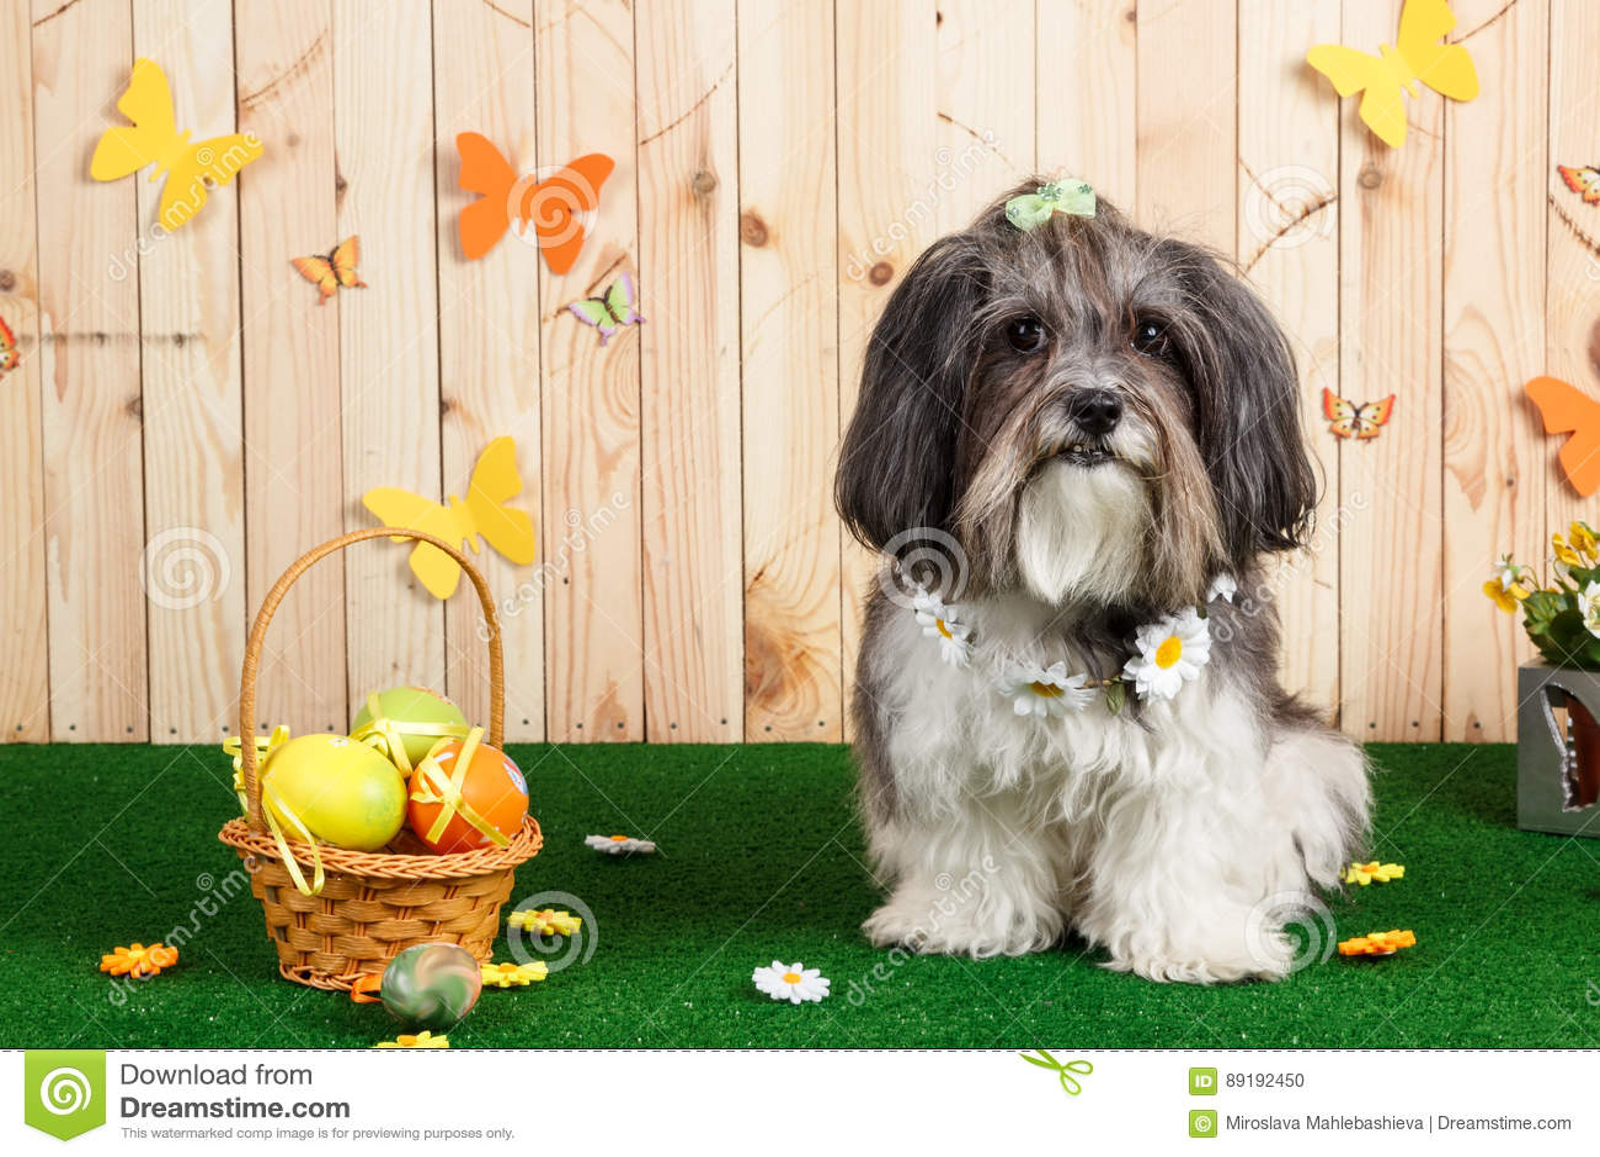 Studio shot of a cute dog in vibrant Spring Easter scene